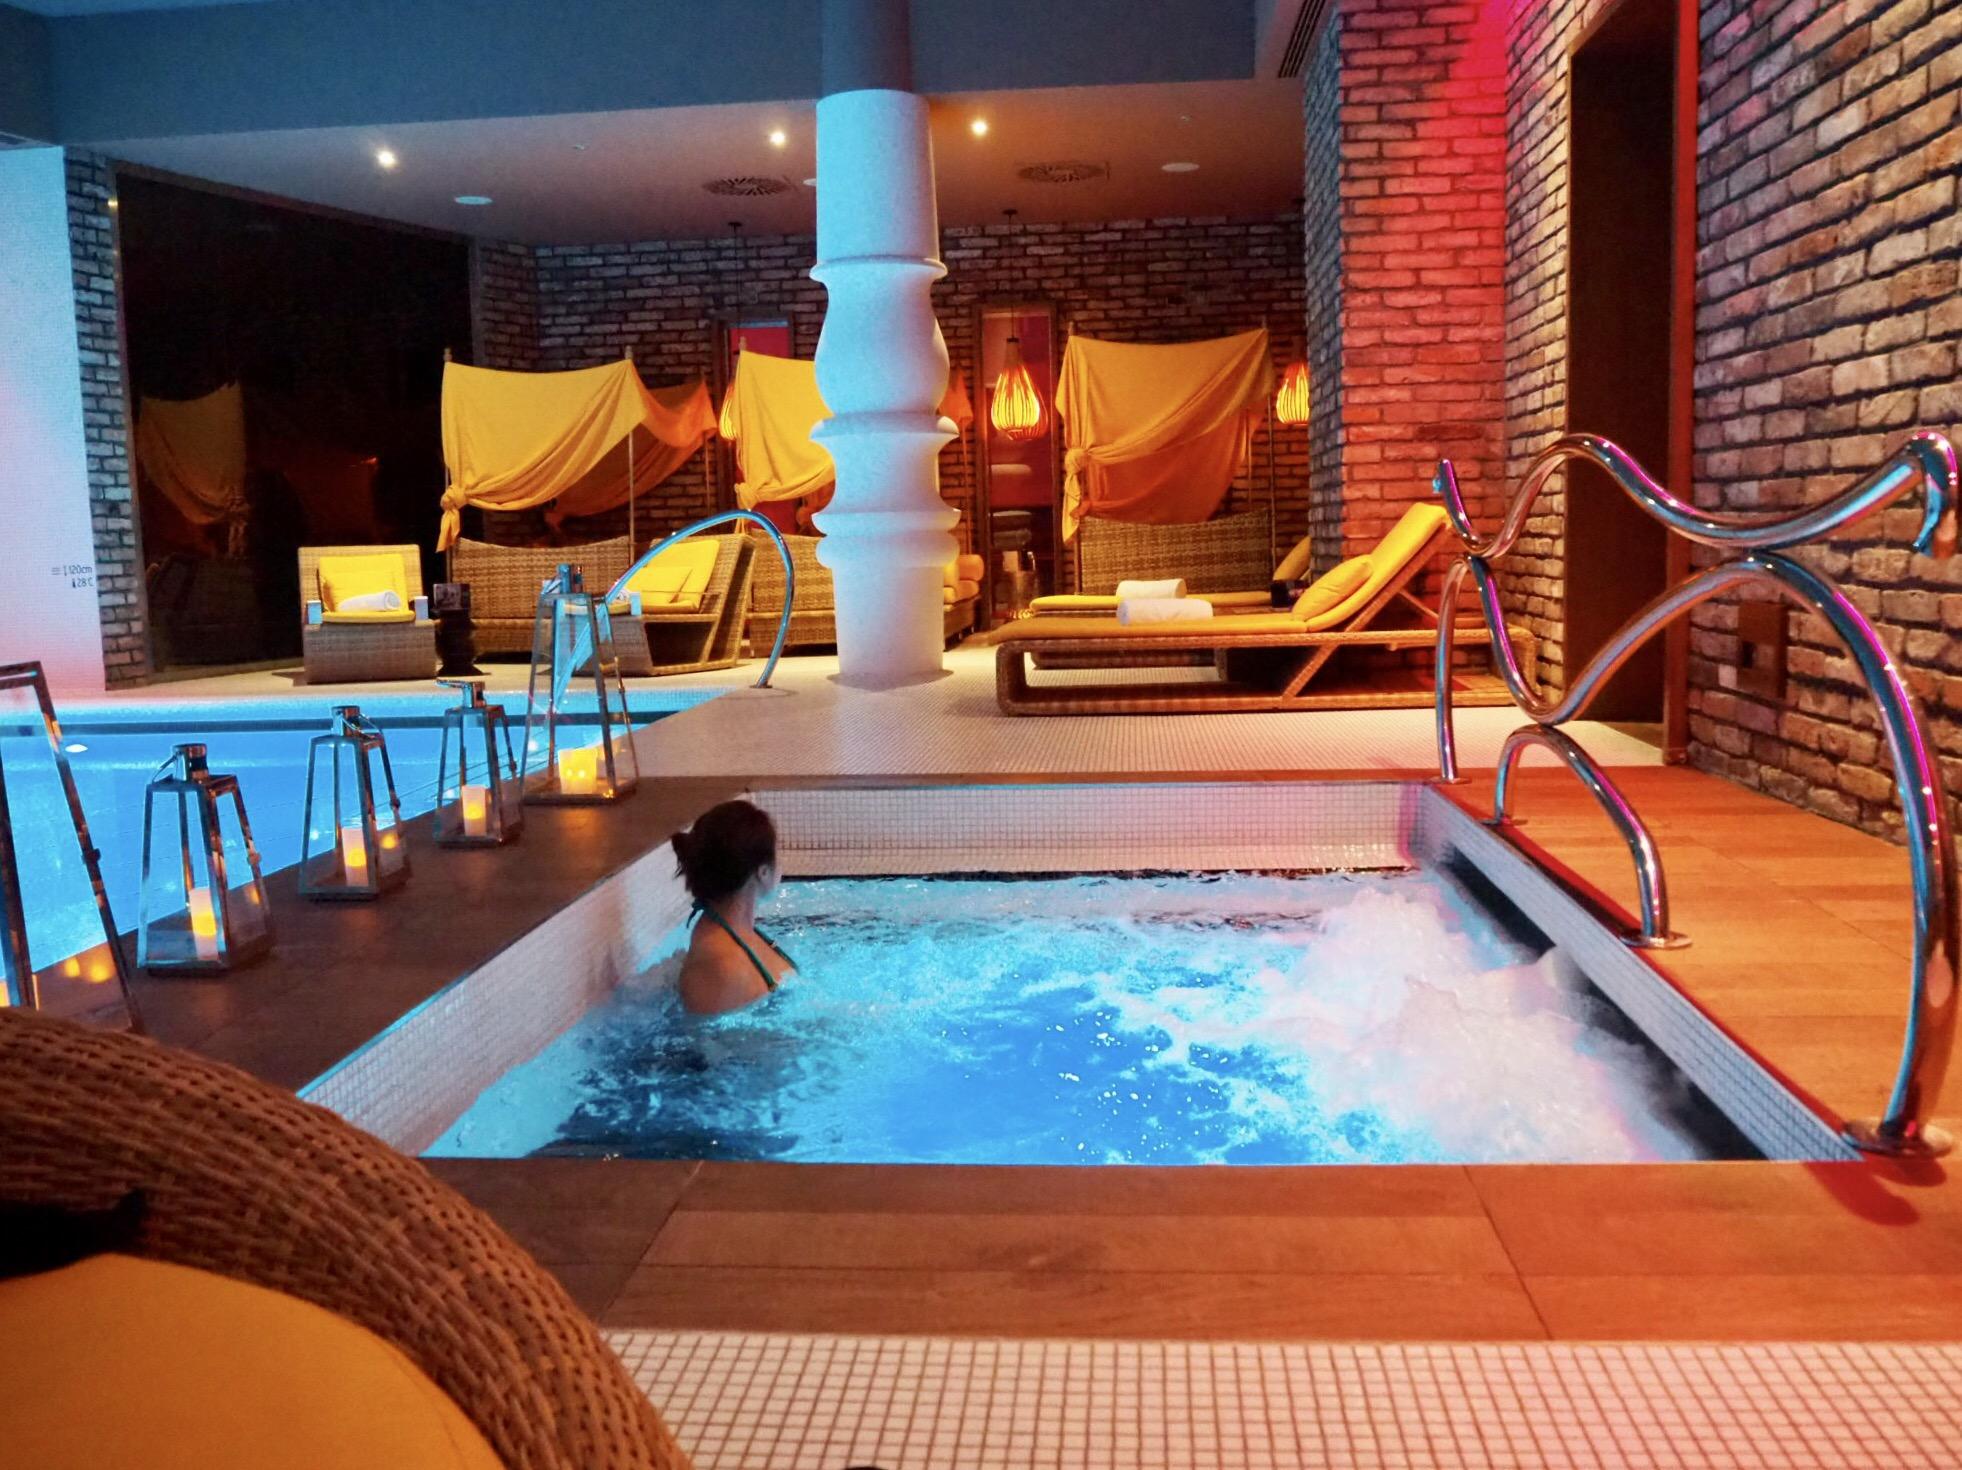 img 4505 - Aria Hotel Budapest HARMONY SPA - 旅の途中の休息時間。ブダペストでのご褒美スパ